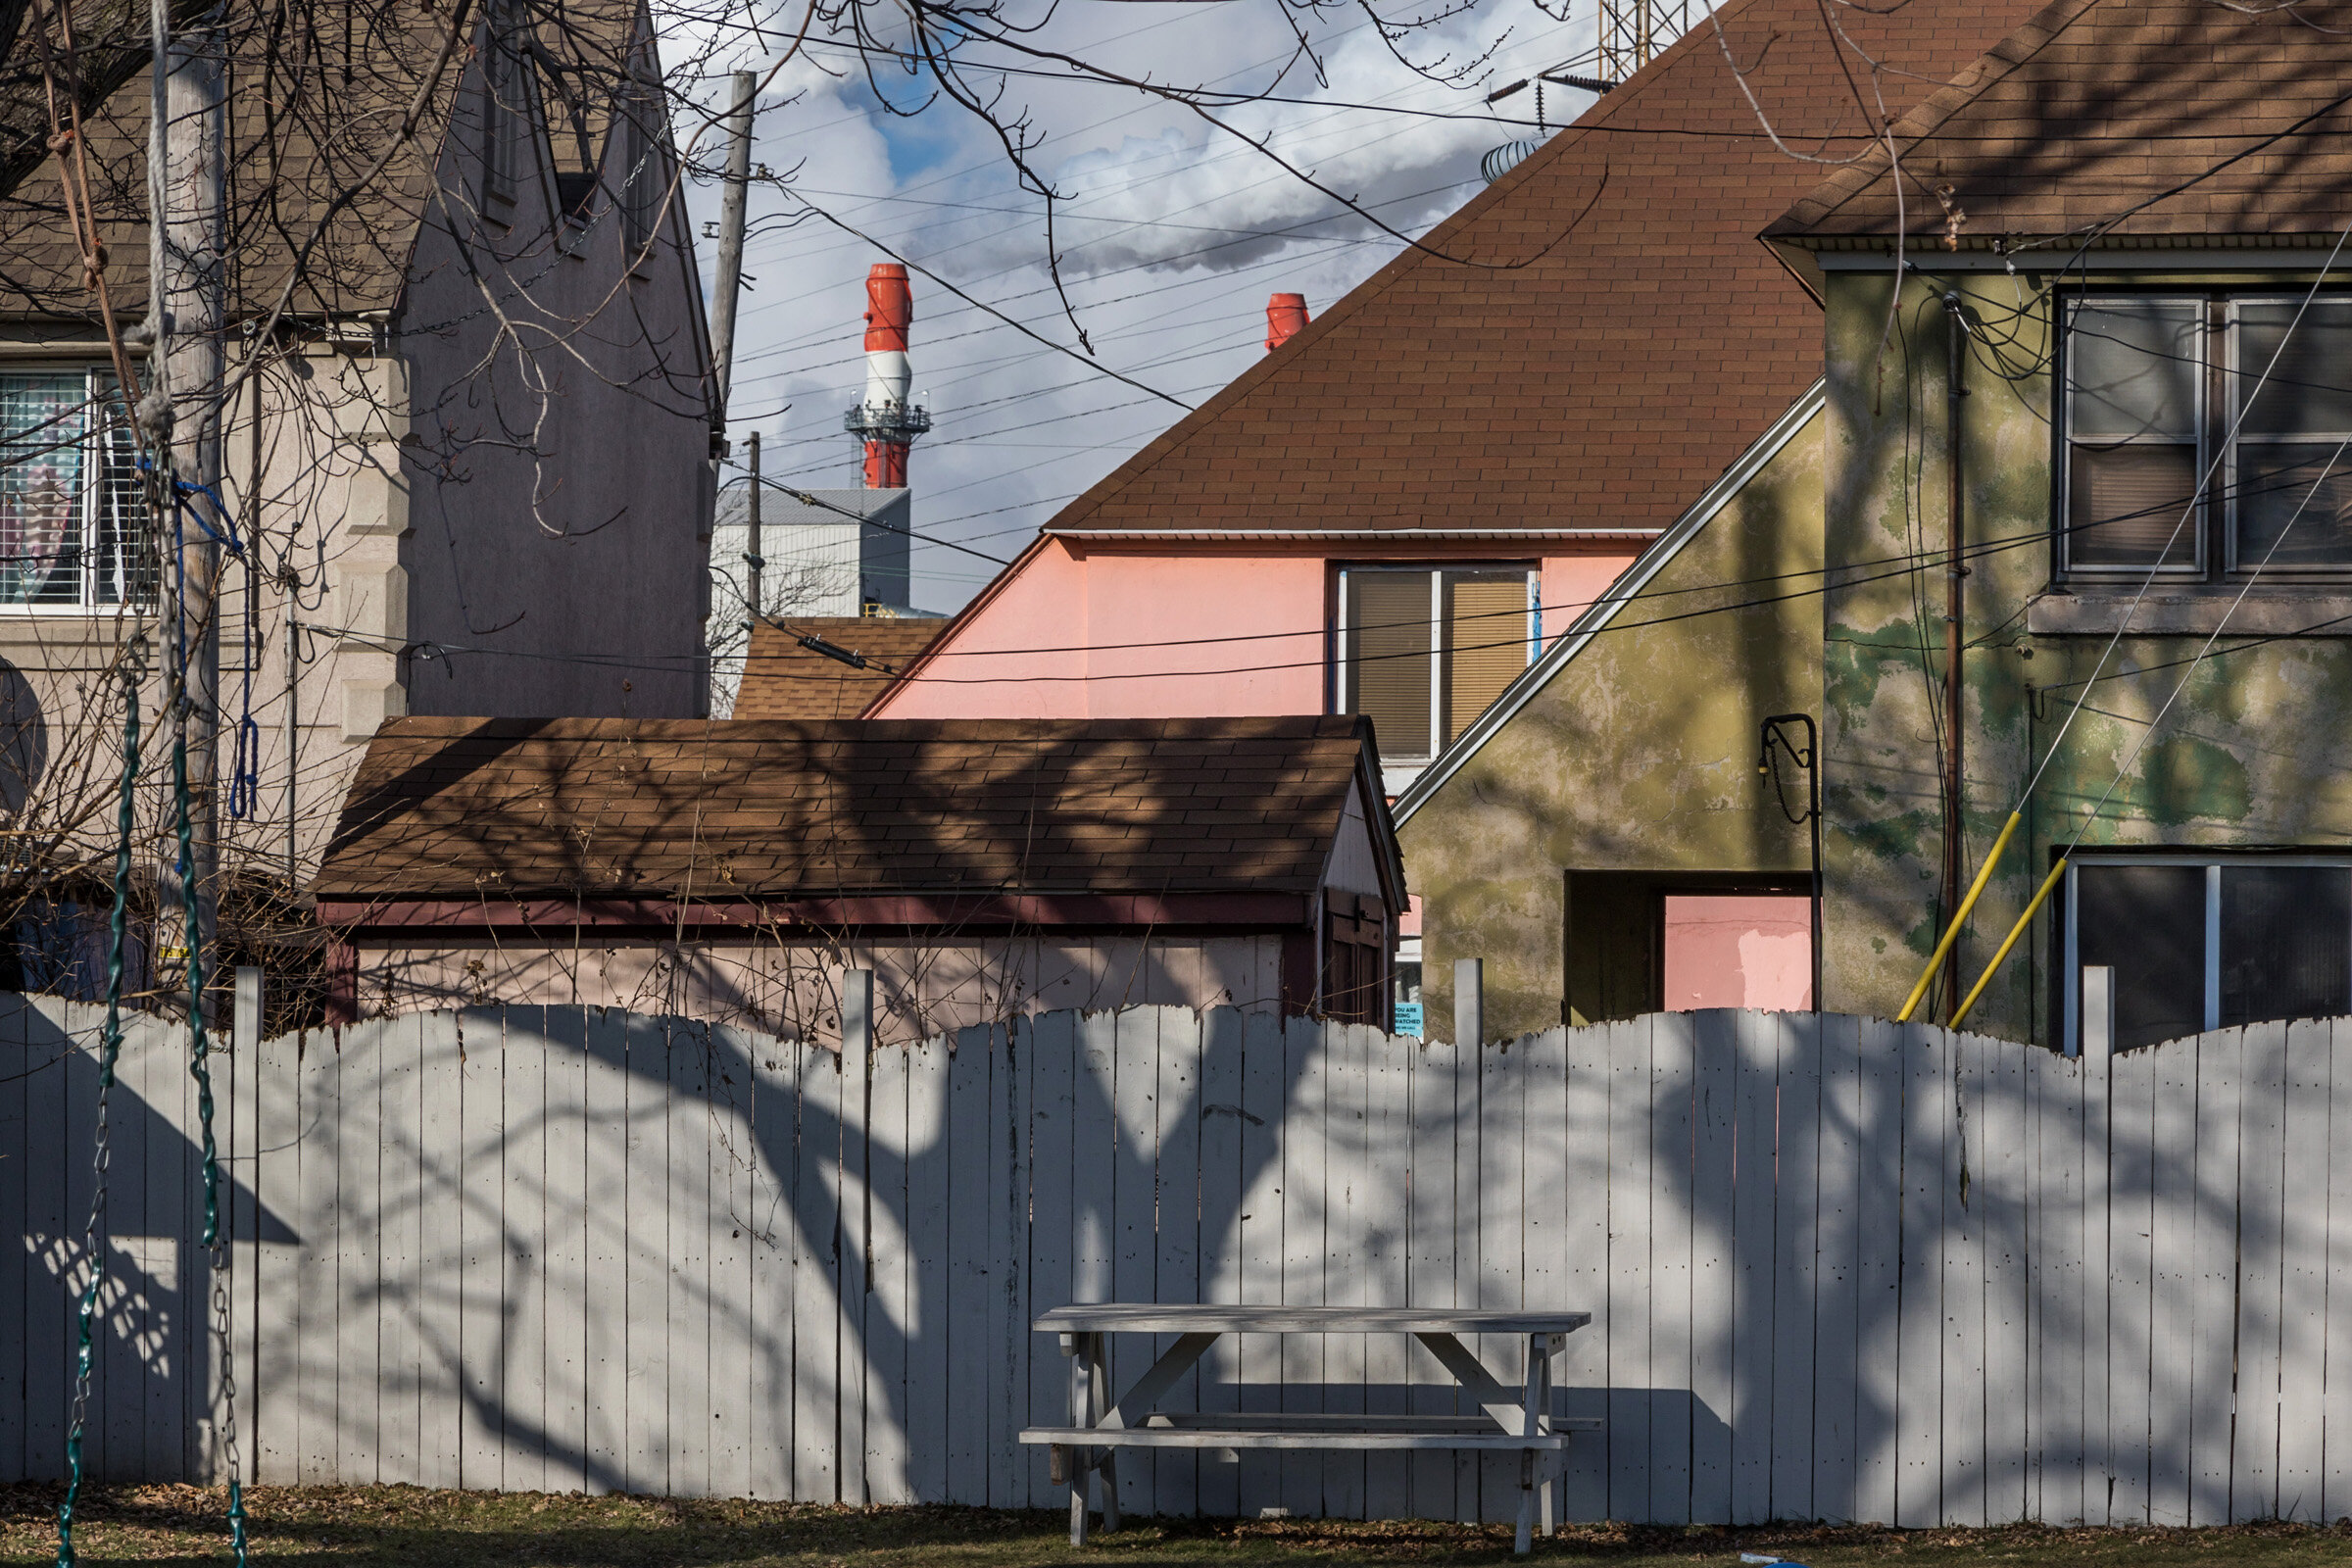 Figure 3. Marktown Neighborhood of East Chicago, Indiana, January 2017. Photograph by Matthew Kaplan.